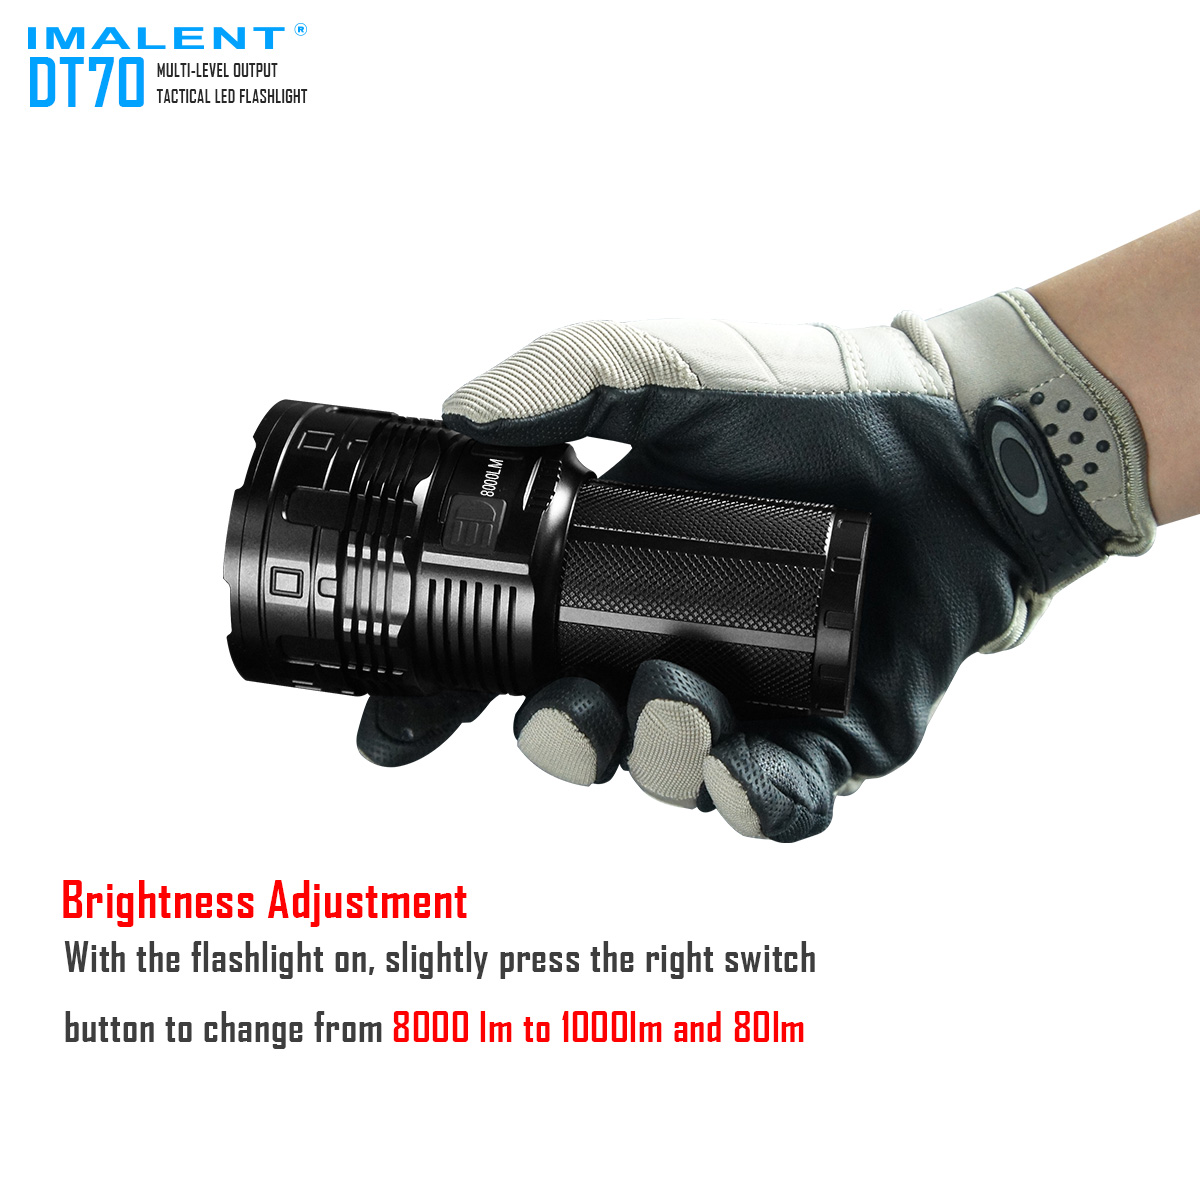 DT70 IMALENT linterne recargable 16000